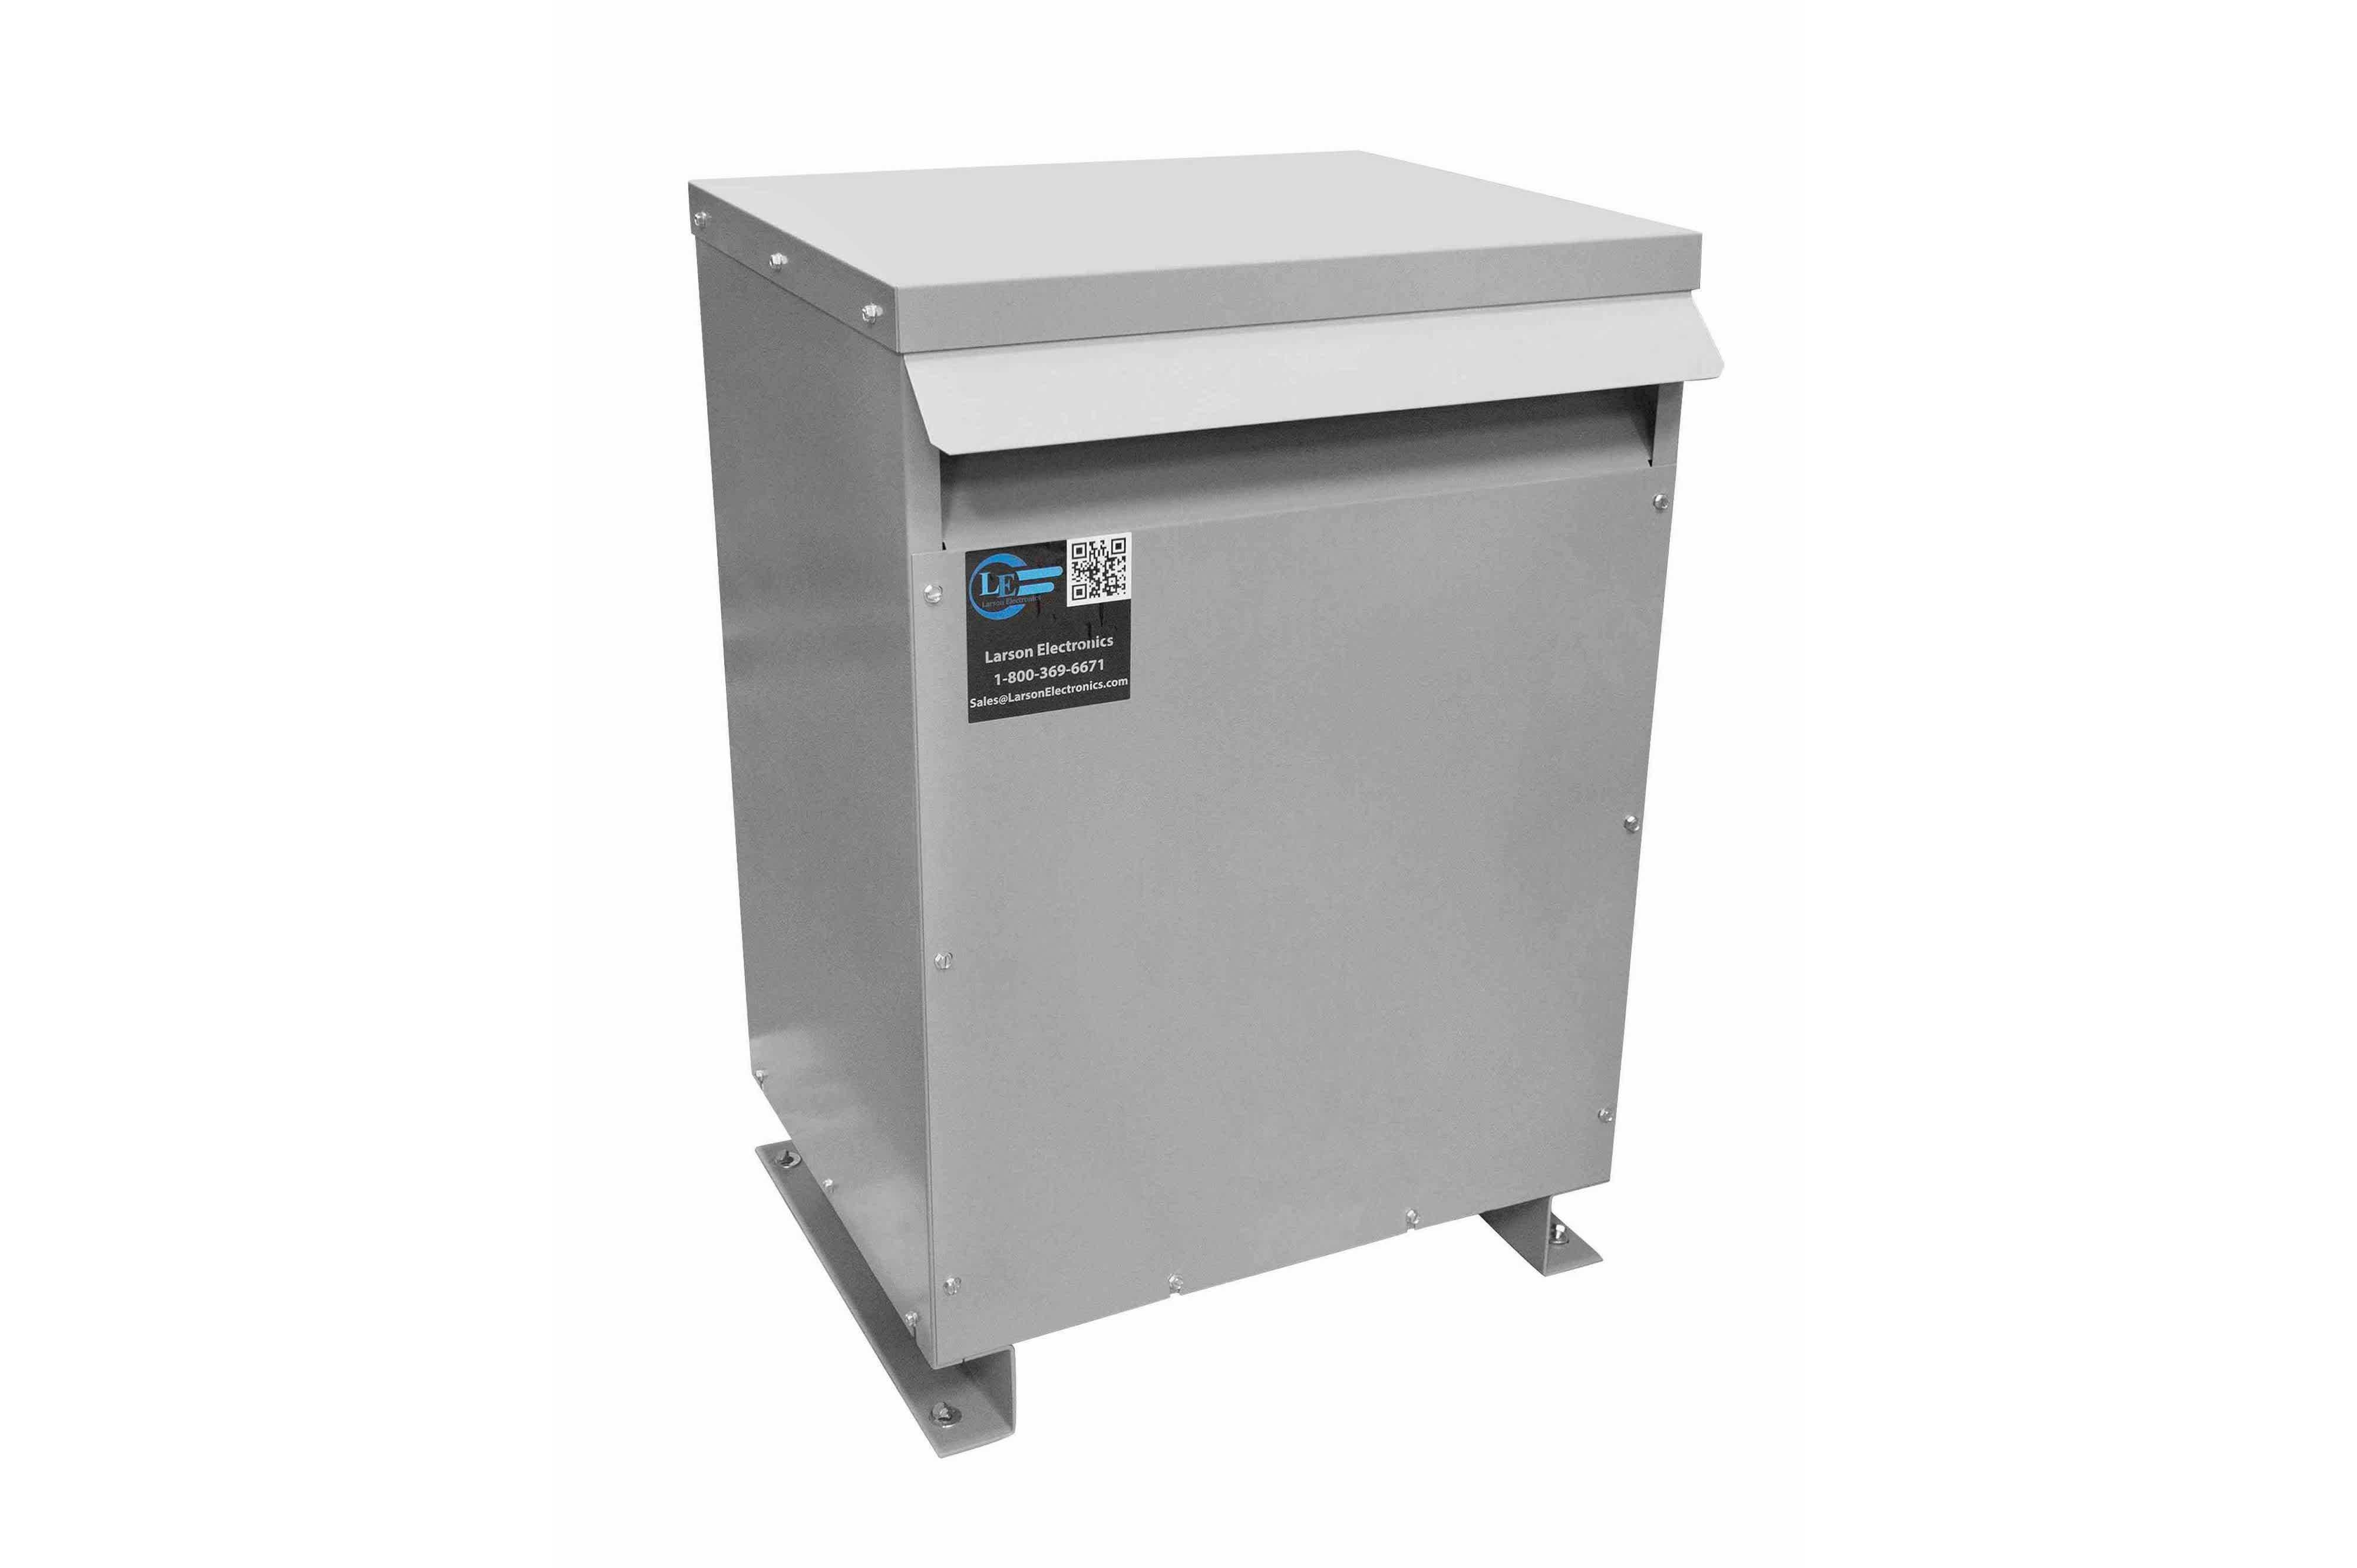 137.5 kVA 3PH Isolation Transformer, 600V Wye Primary, 460Y/266 Wye-N Secondary, N3R, Ventilated, 60 Hz